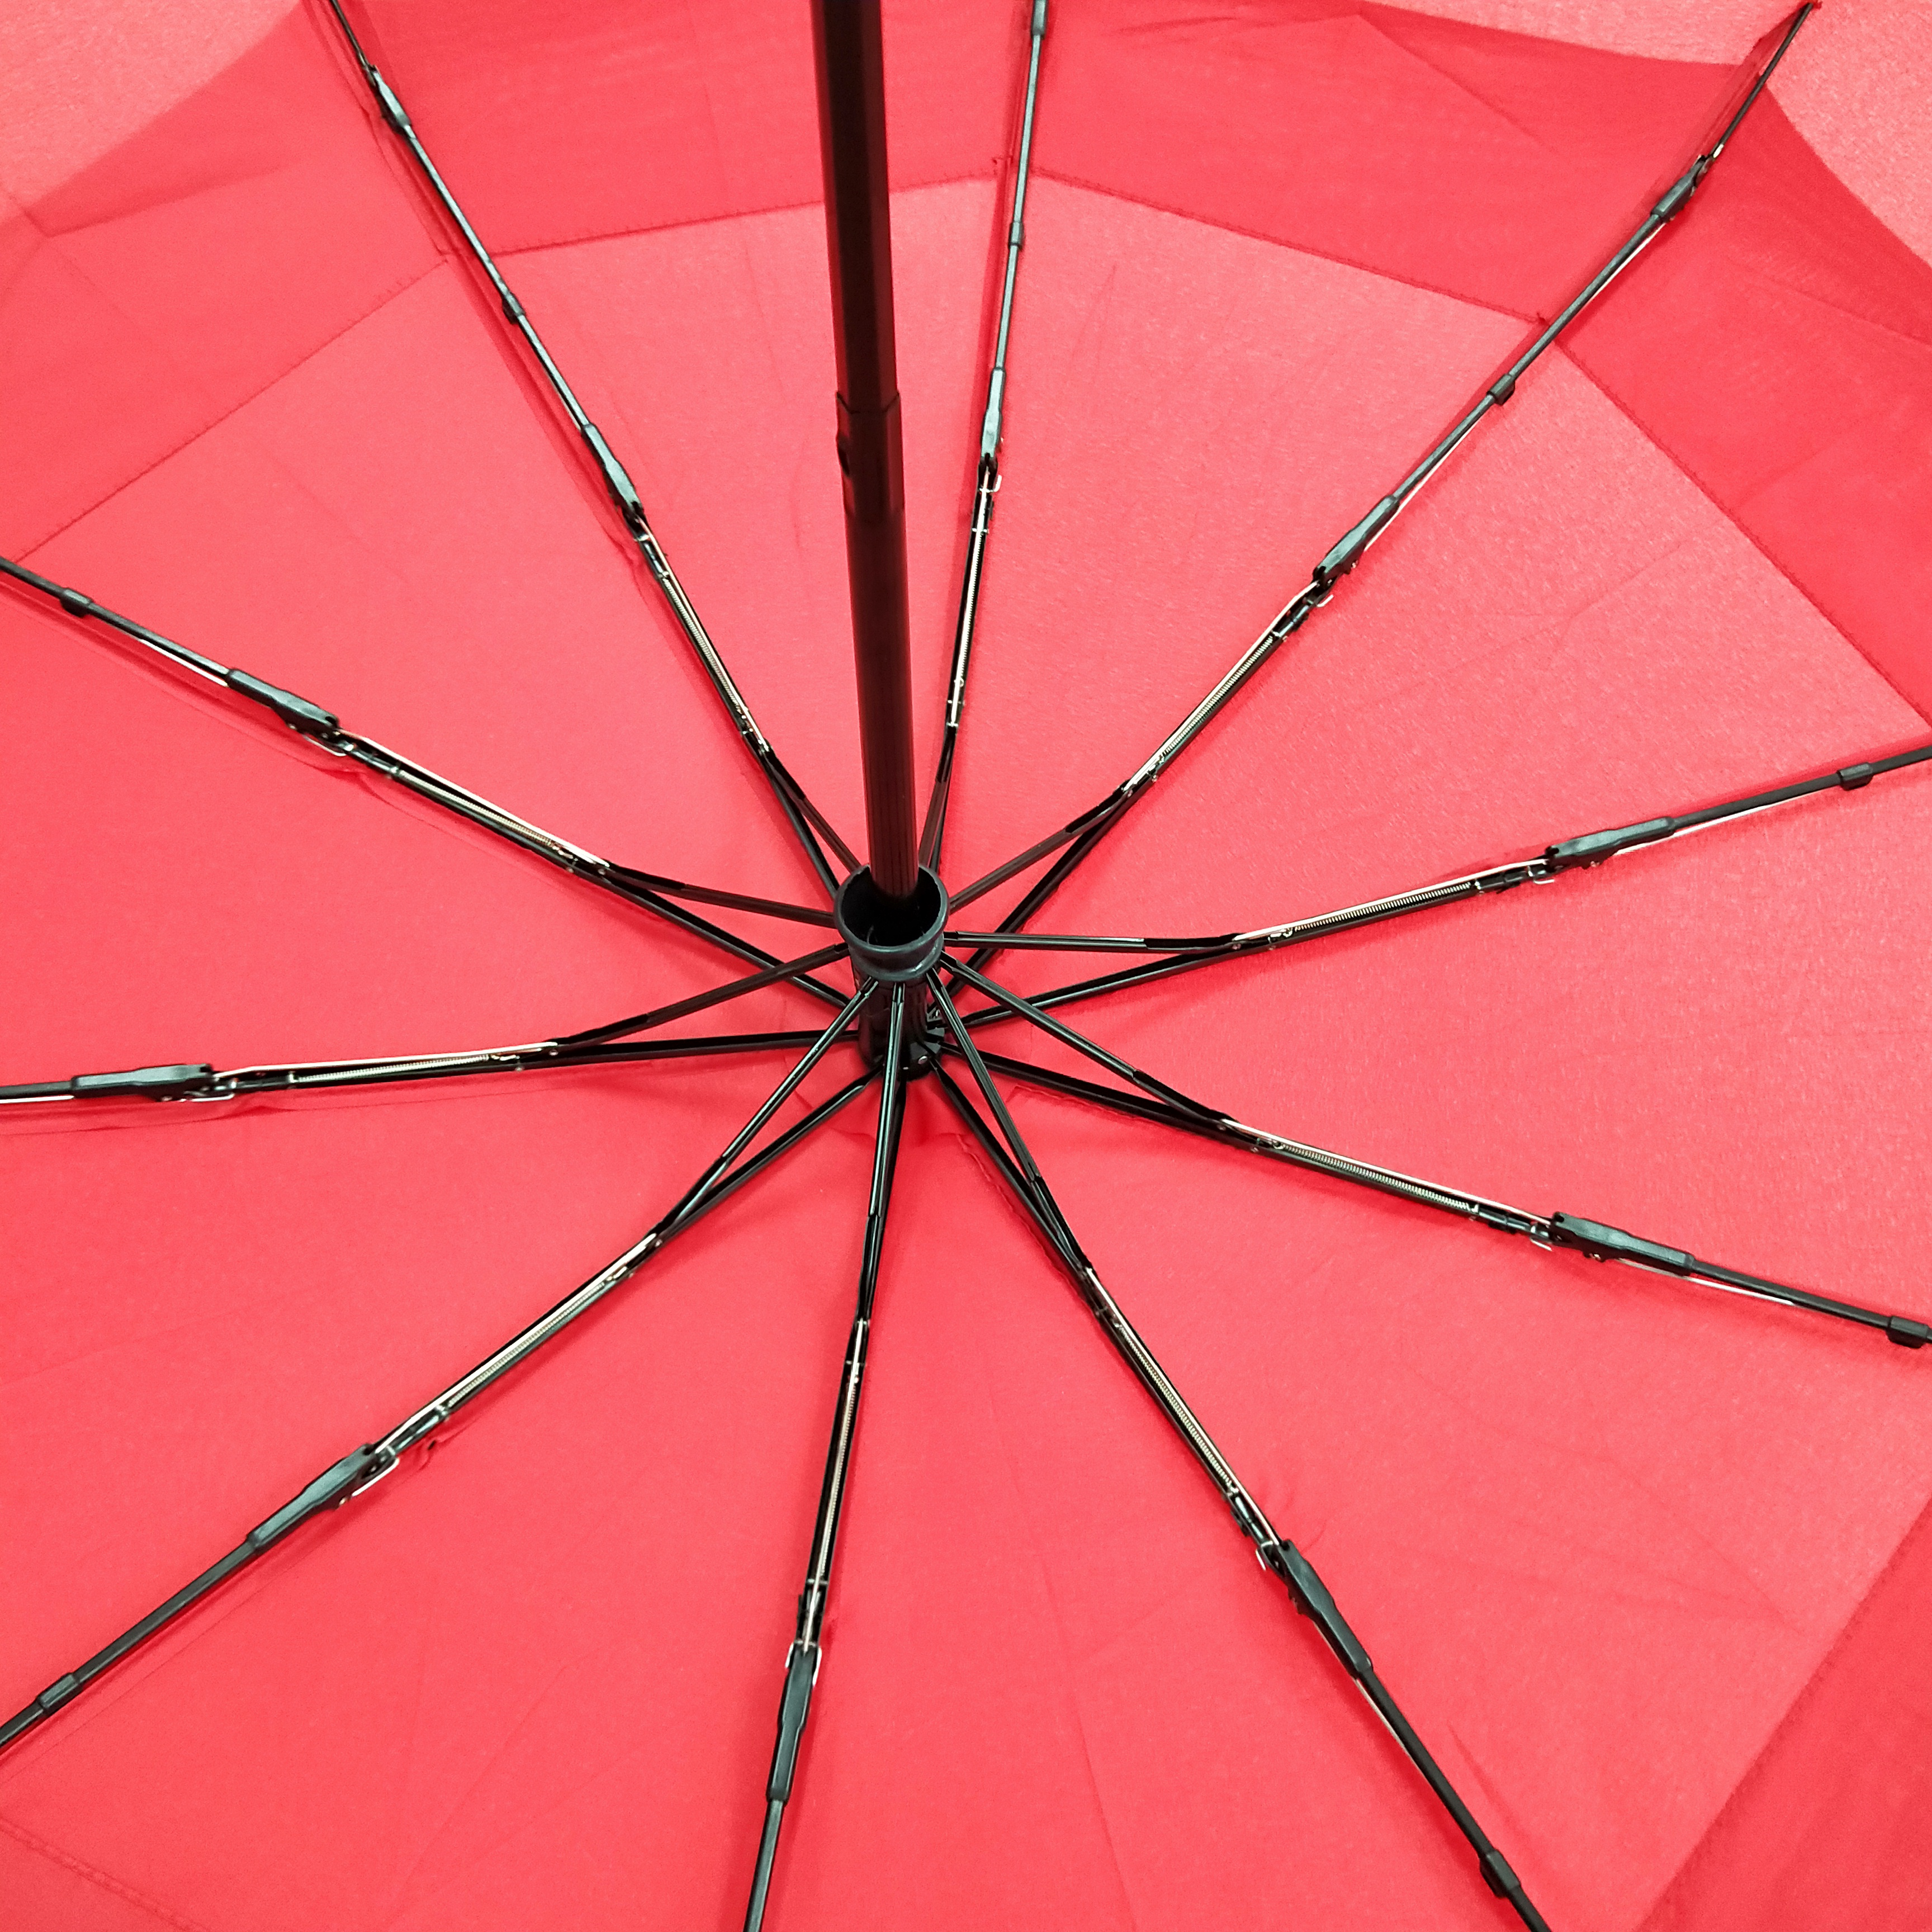 Ribs Branded Umbrellas Vented Telescopic Umbrella